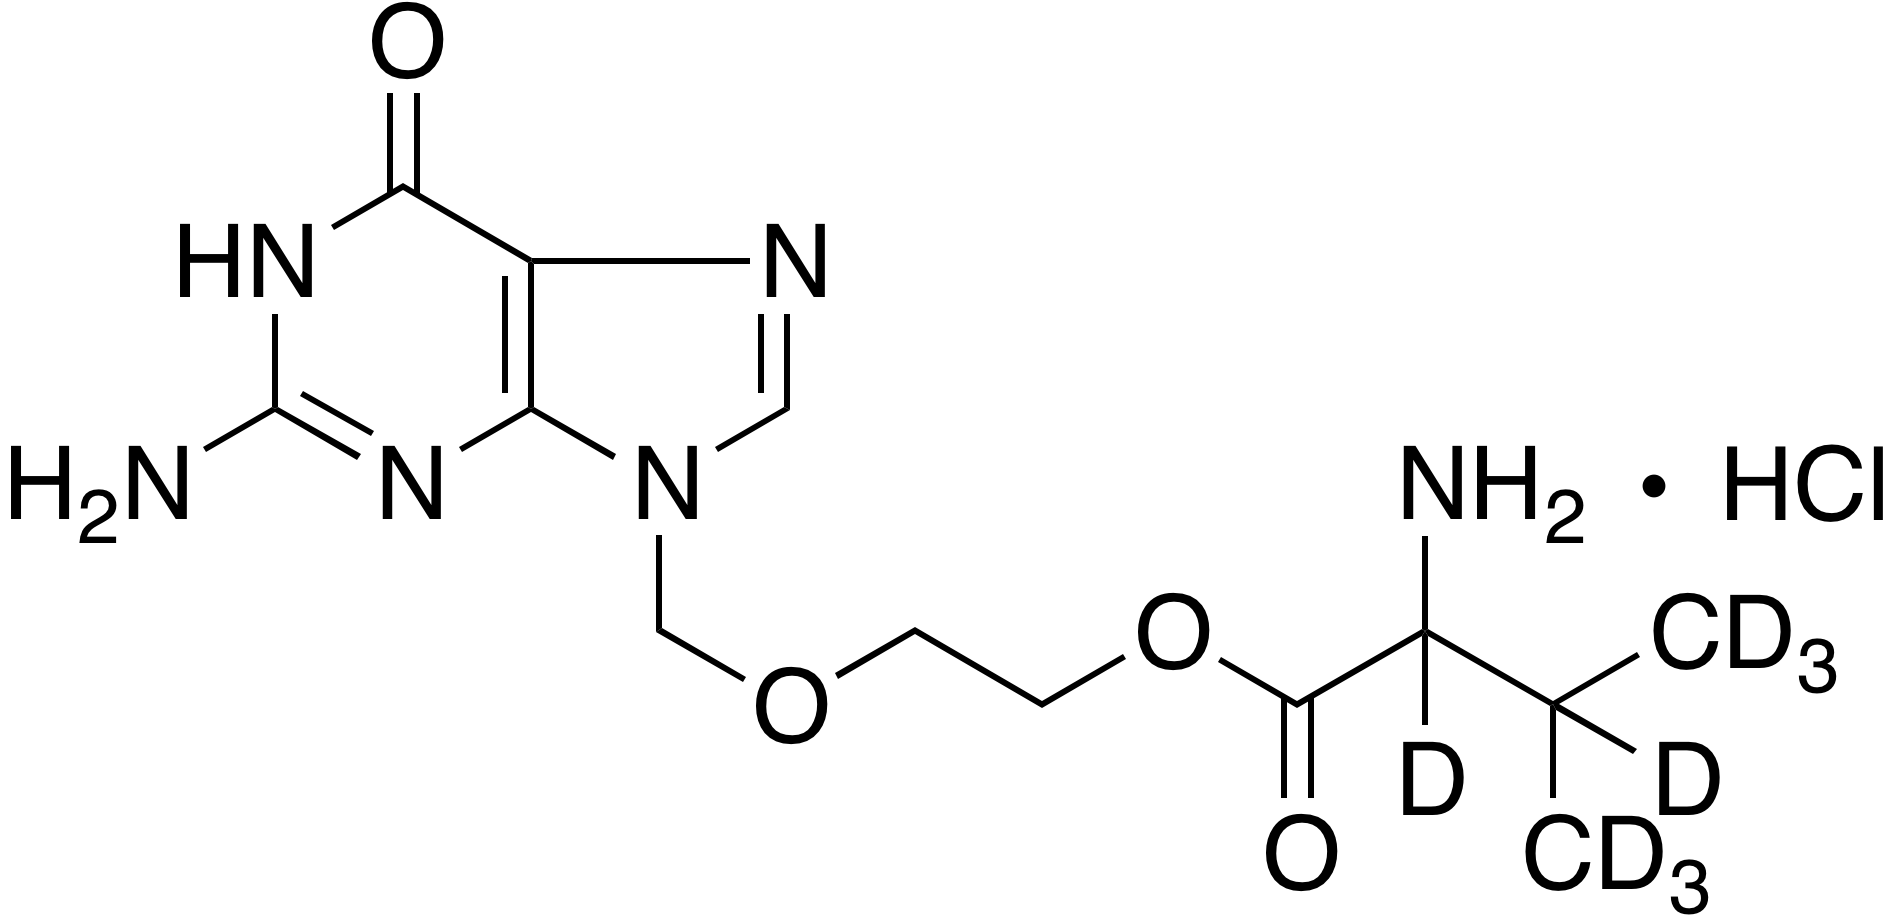 rac-Valacyclovir-d<sub>8</sub> hydrochloride